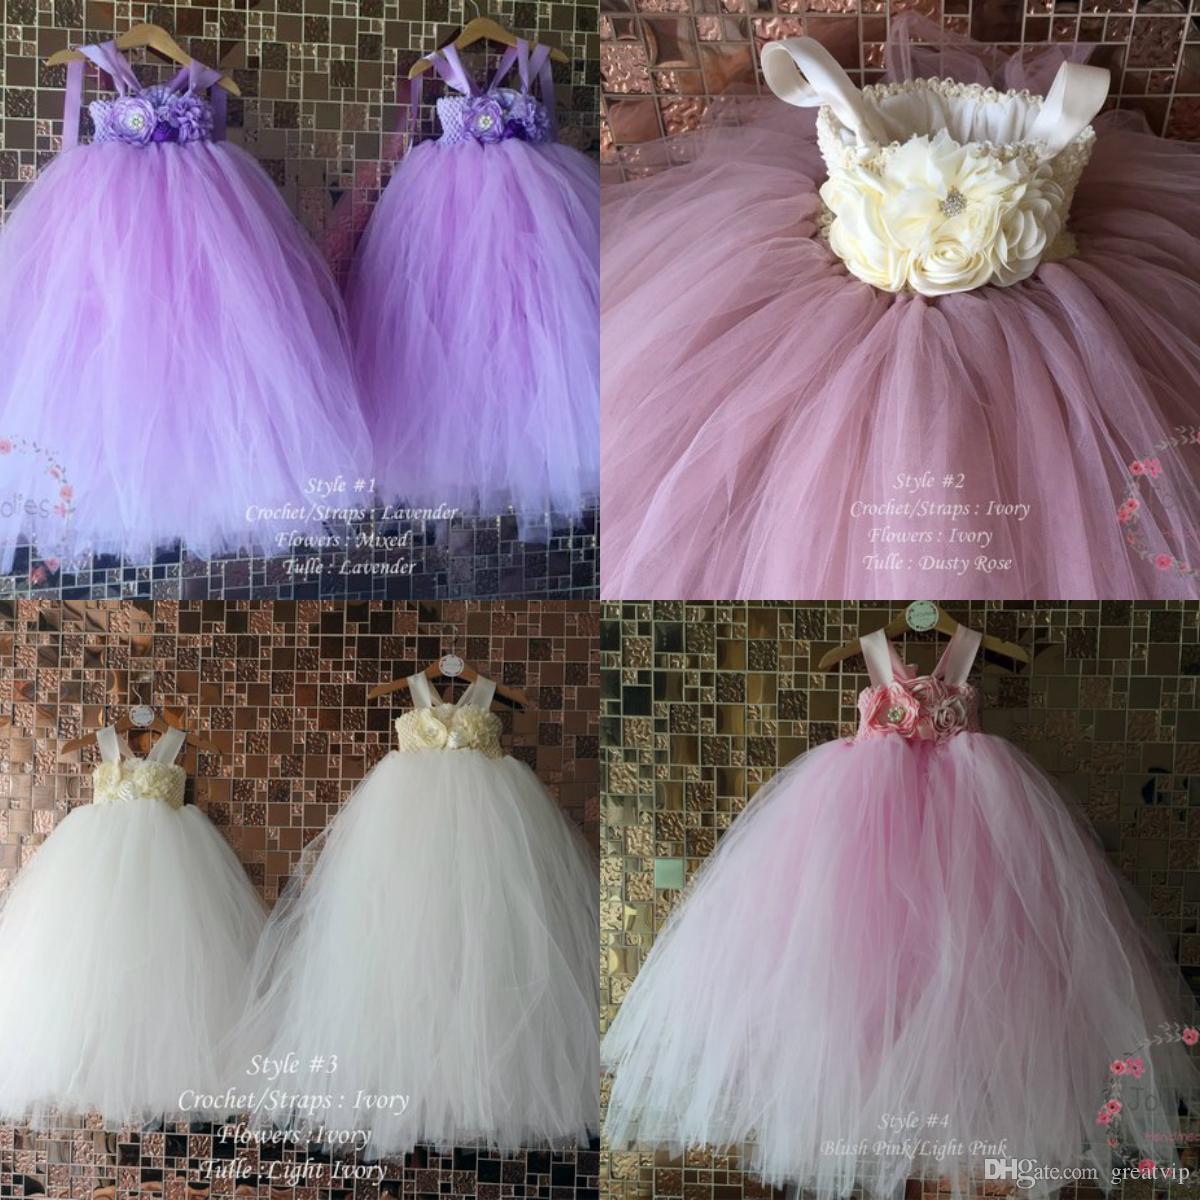 6d42c8b2836 Lovely Flower Girl Dresses Ball Gown Spaghetti Handmade Flower Princess  Birthday Party Dress Baby Kids Custom Made Gowns Bridesmaid Dresses Uk Cute  Dresses ...